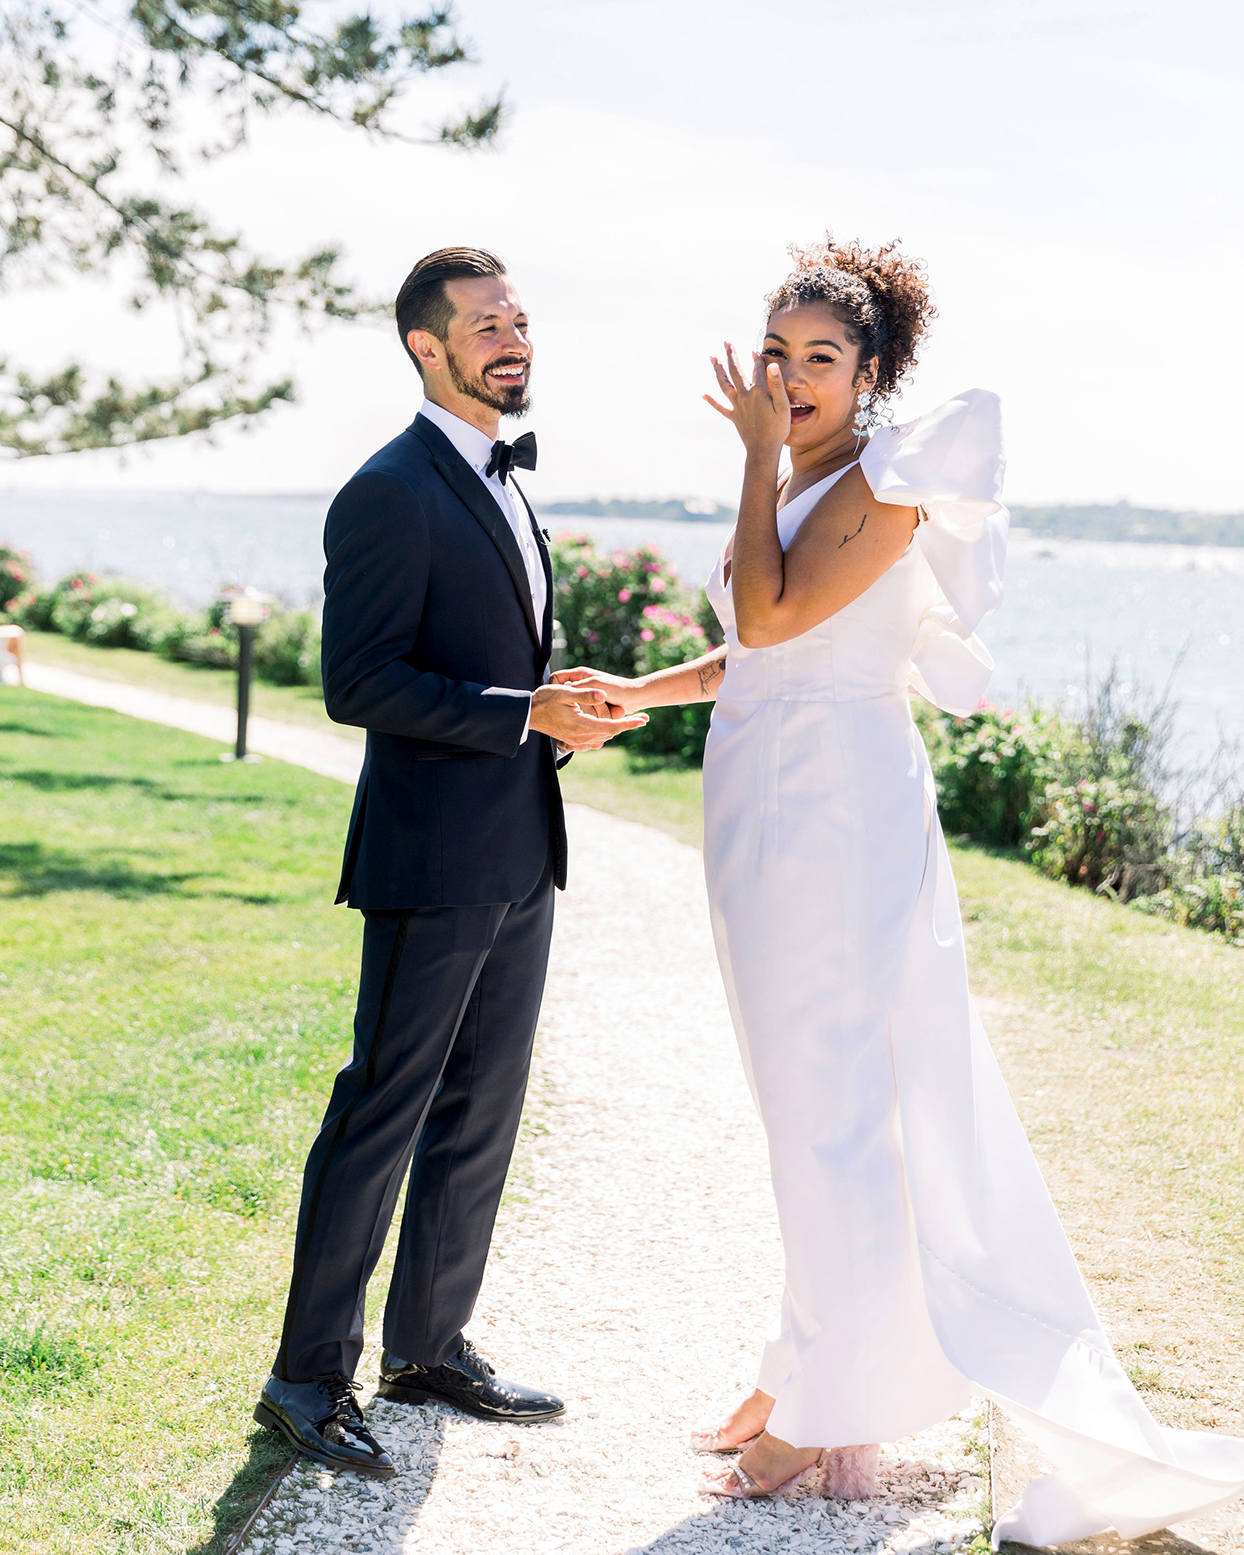 dalila elliot wedding couple first look